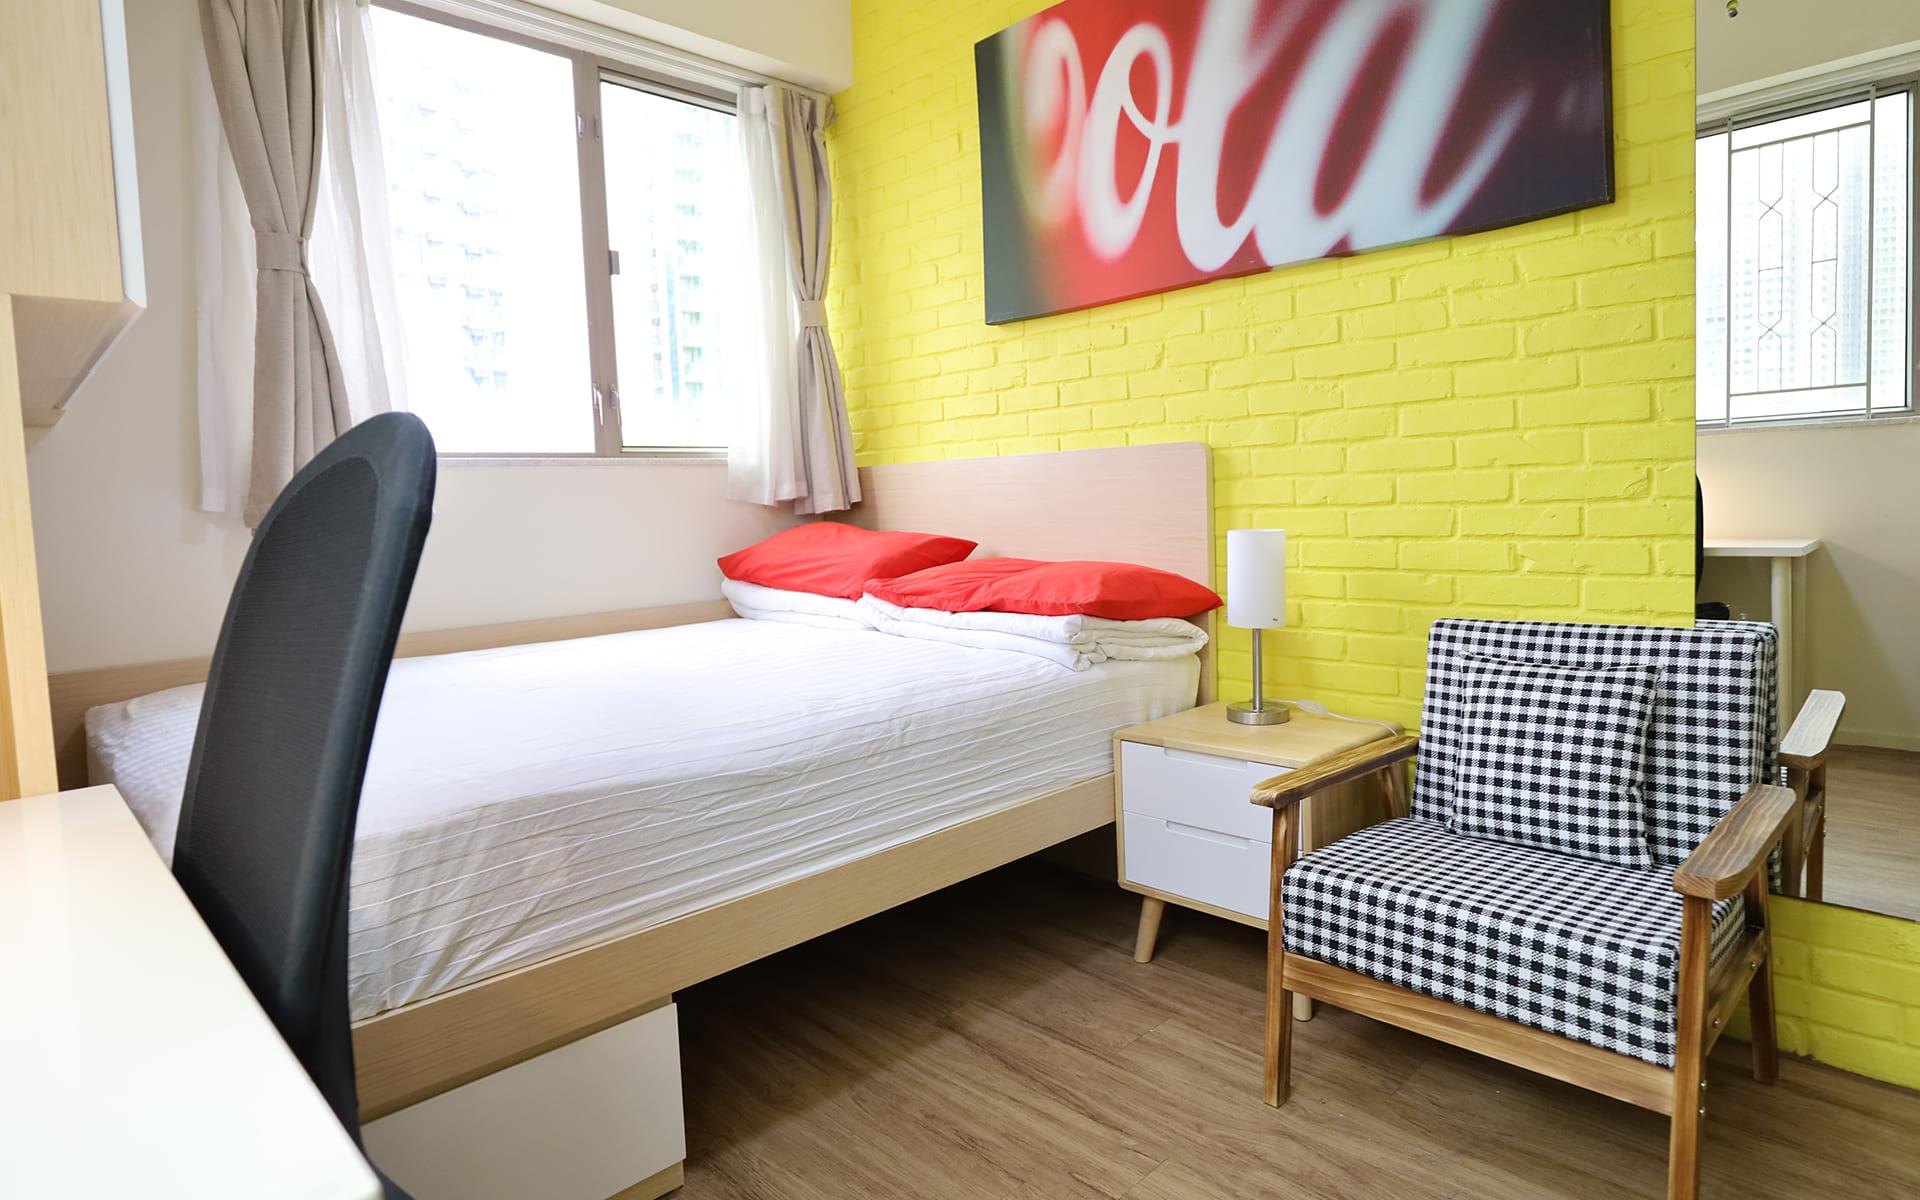 hk_service_apartment_10967507401596694985.jpg